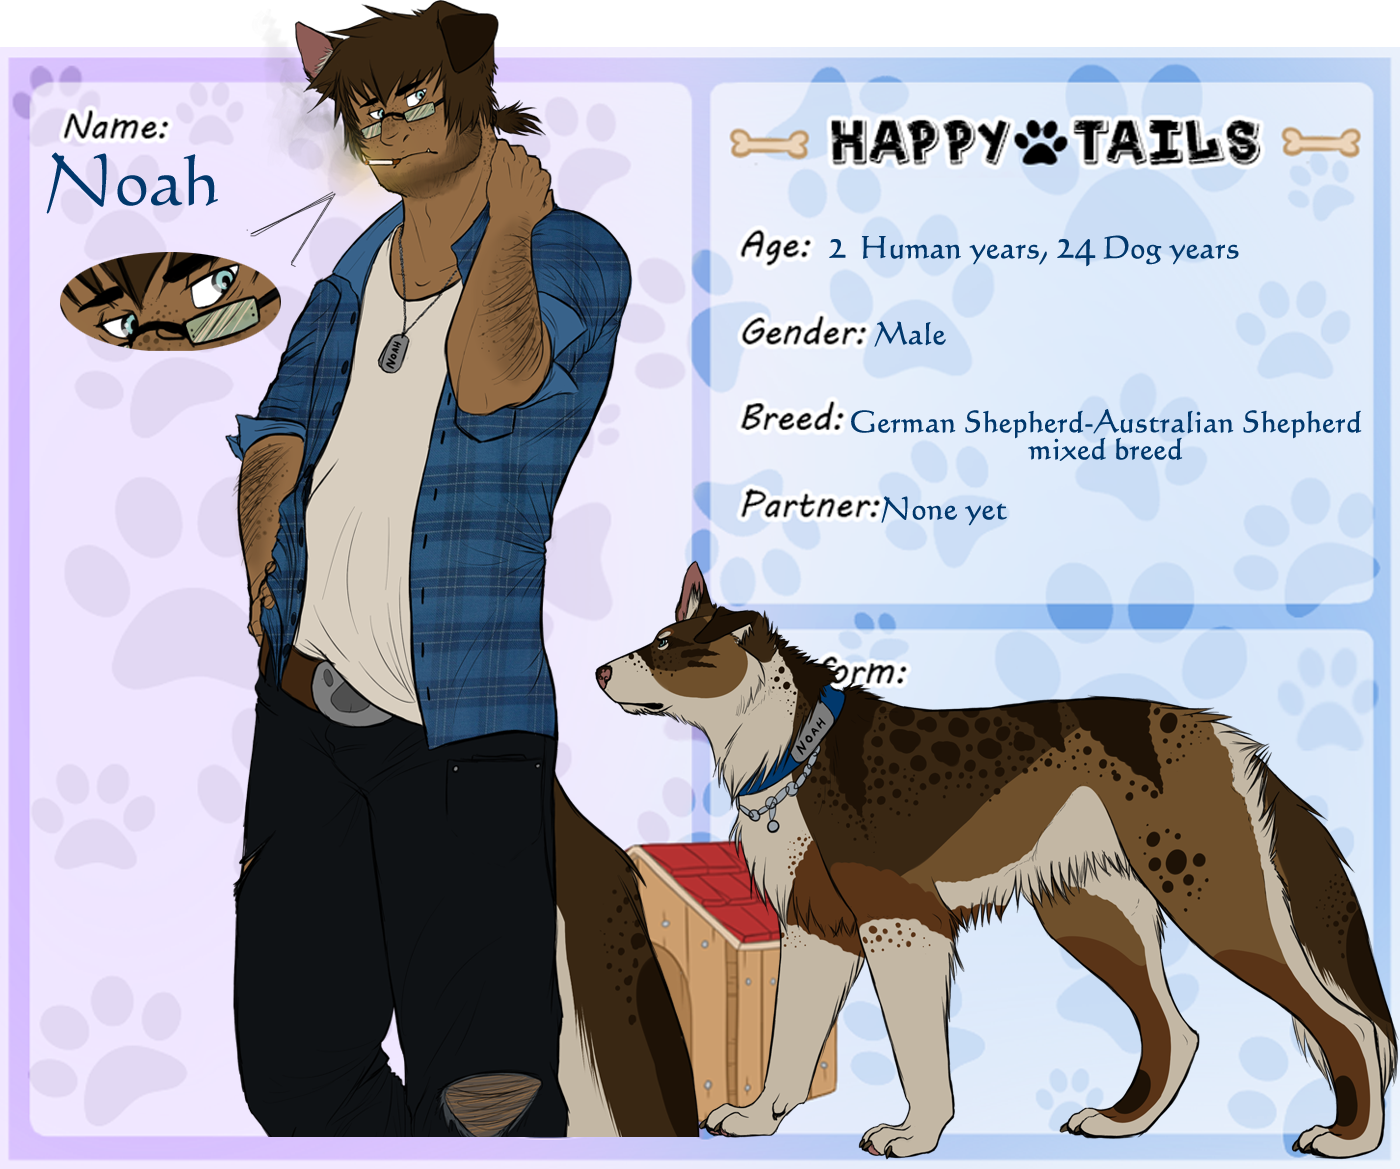 Happy Tails: Noah the Shepherd by Rininiri